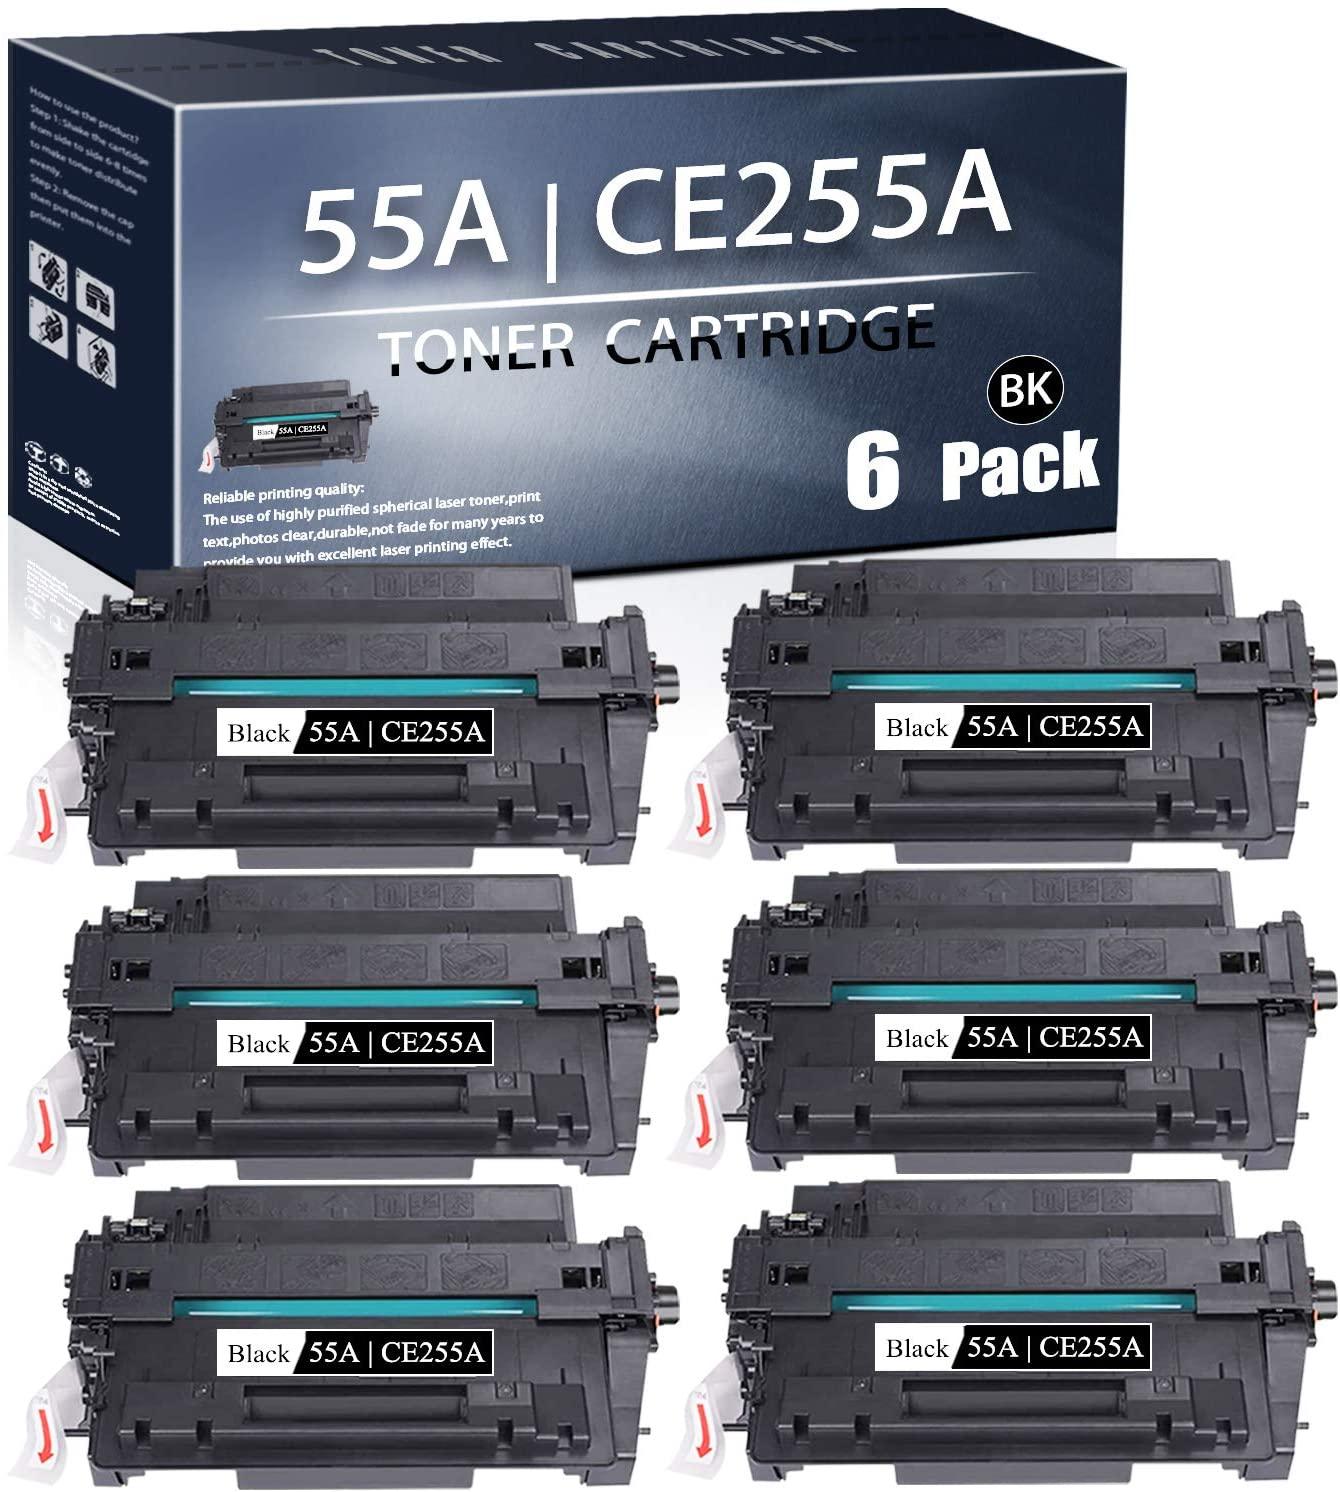 55A | CE255A(Black,6-PK) Compatible TonerCartridge Replacement forHP 55A CE255A Laserjet P3015 Pro MFP M521dn MFP M521dw Enterprise Flow MFP M525c Enterprise 500 MFP M525f Printers TonerCartridge.